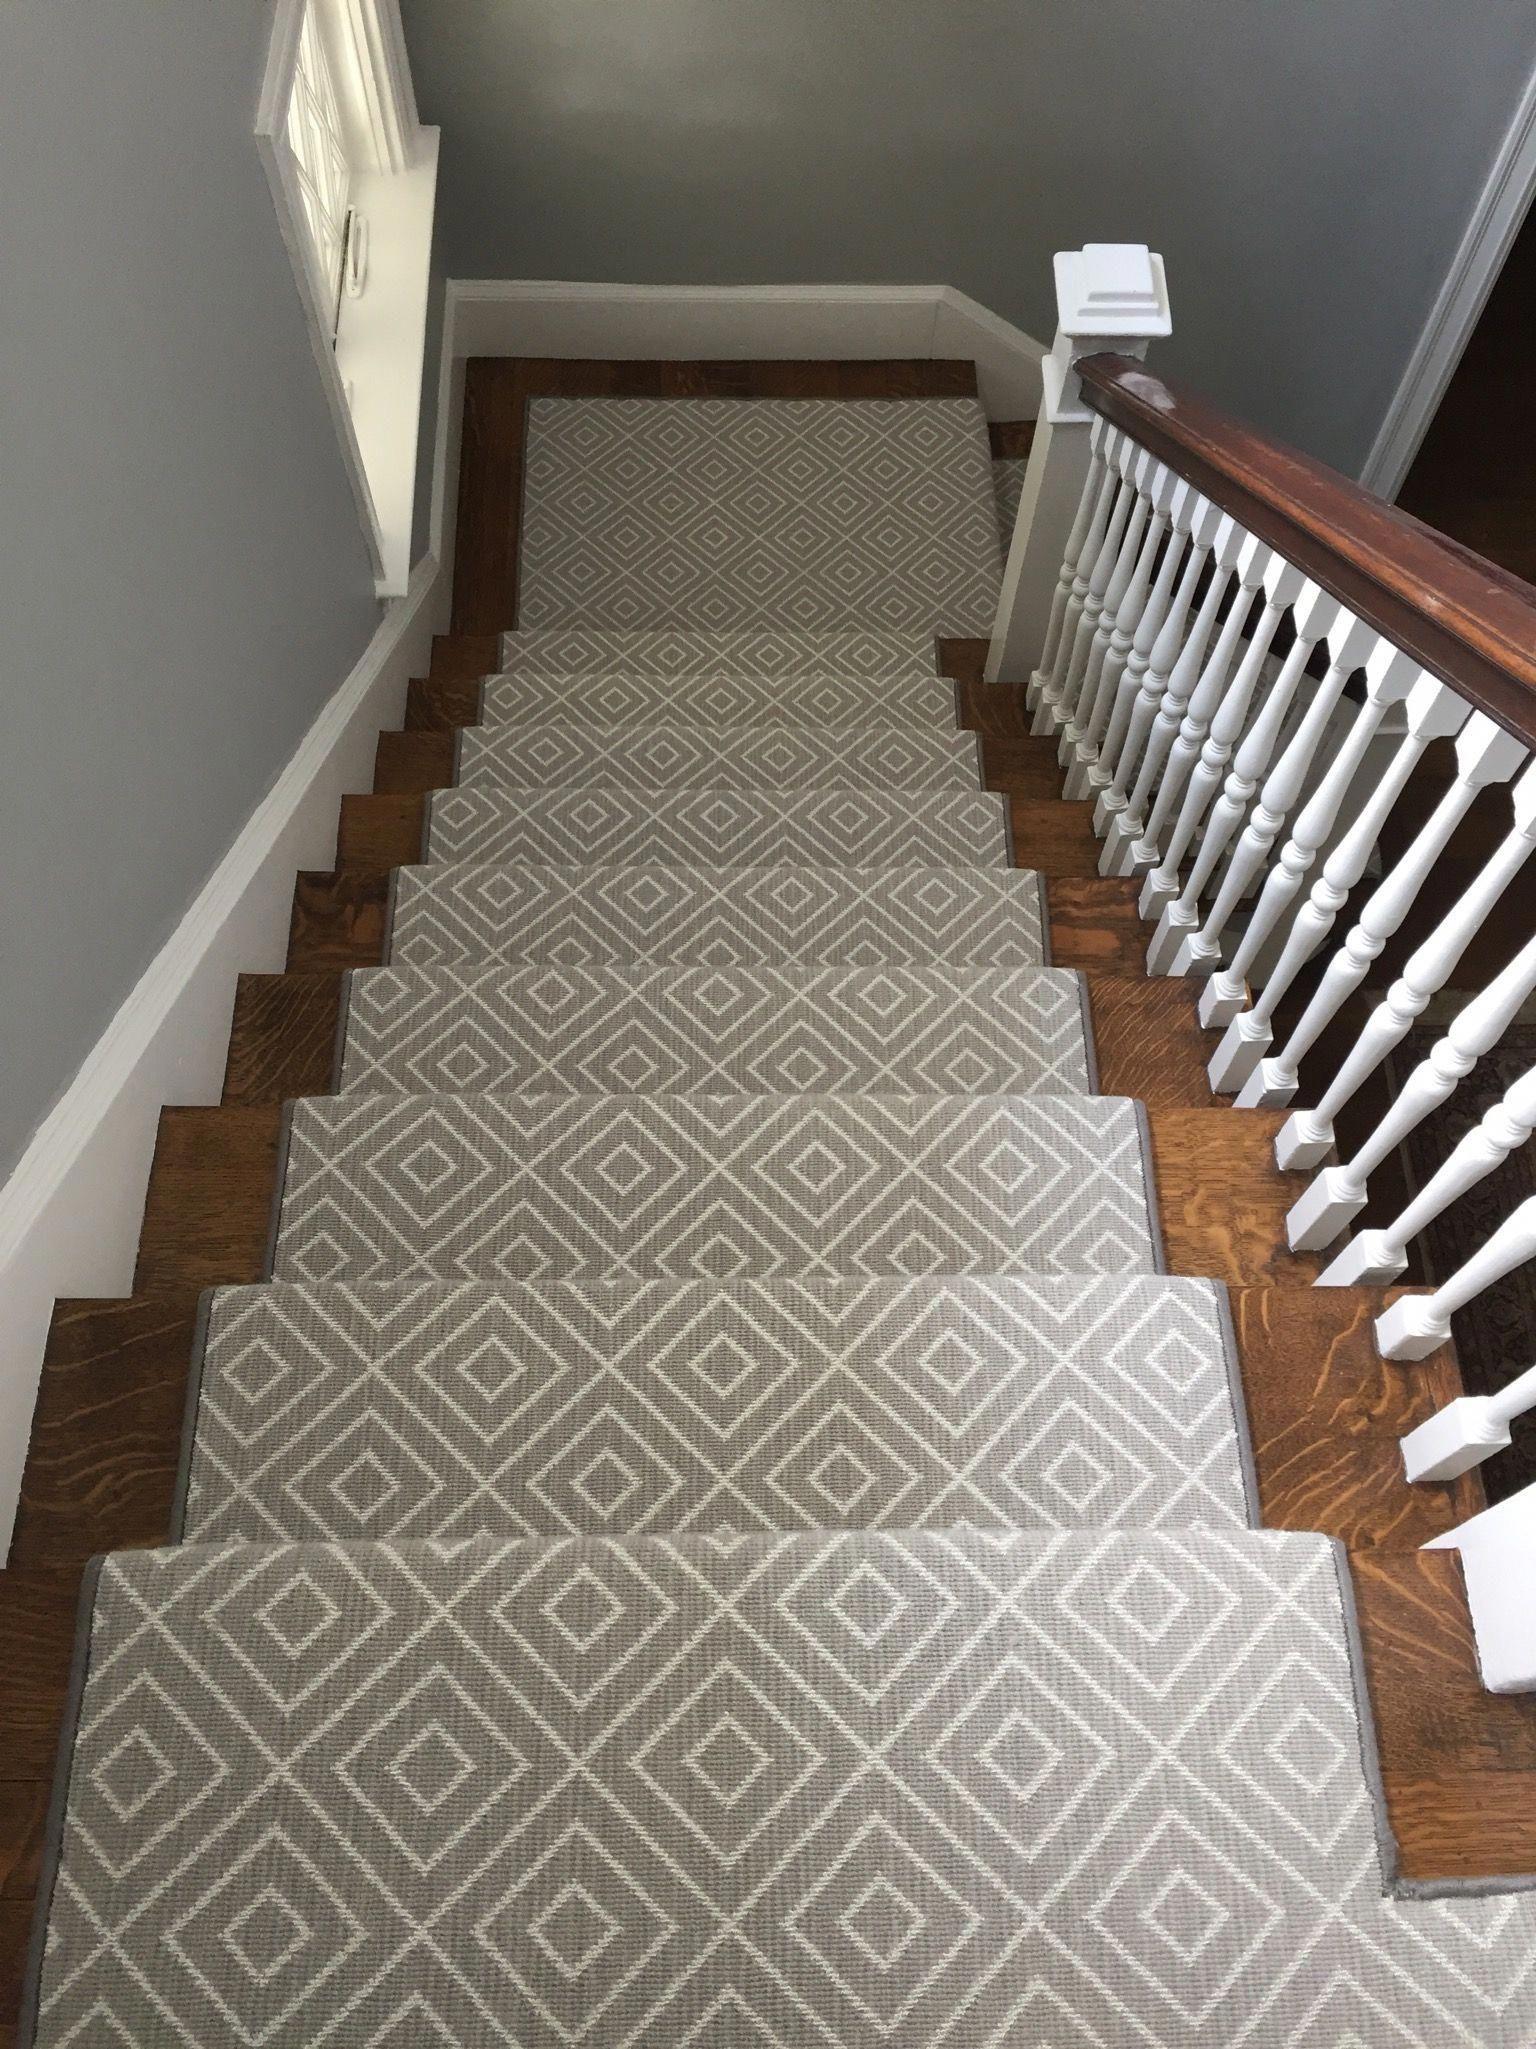 Best Stair Rods For Carpet Runners Carpetrunnersbytheyard 400 x 300